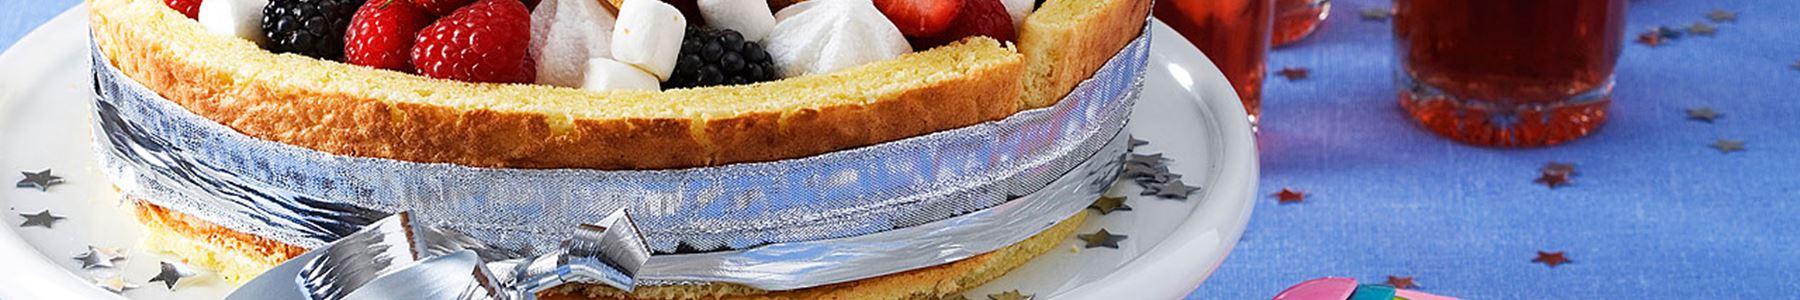 marshmallows tårta recept